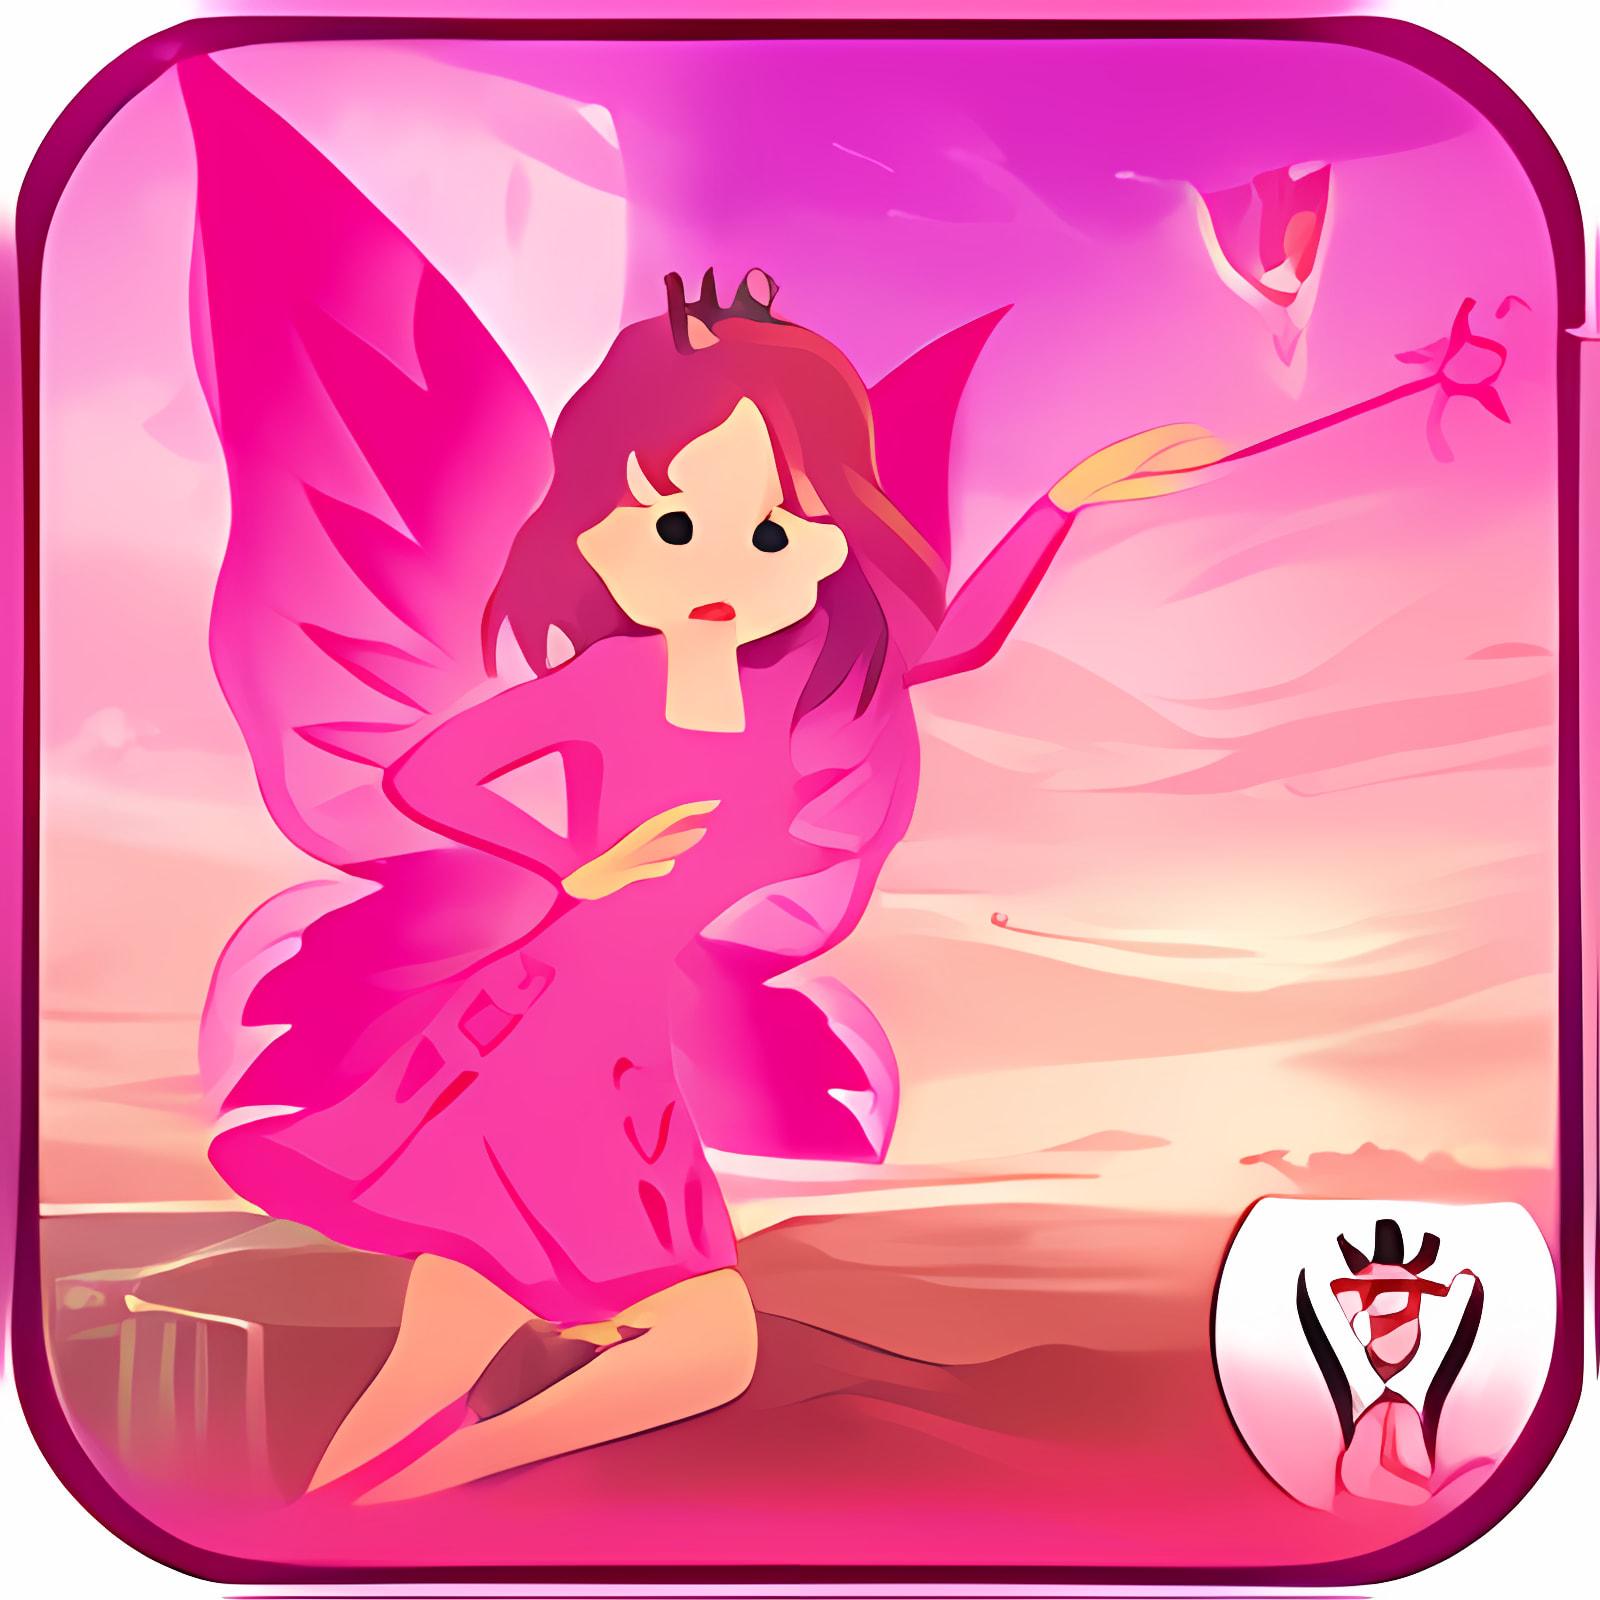 Pink Princess Alien Super Girl